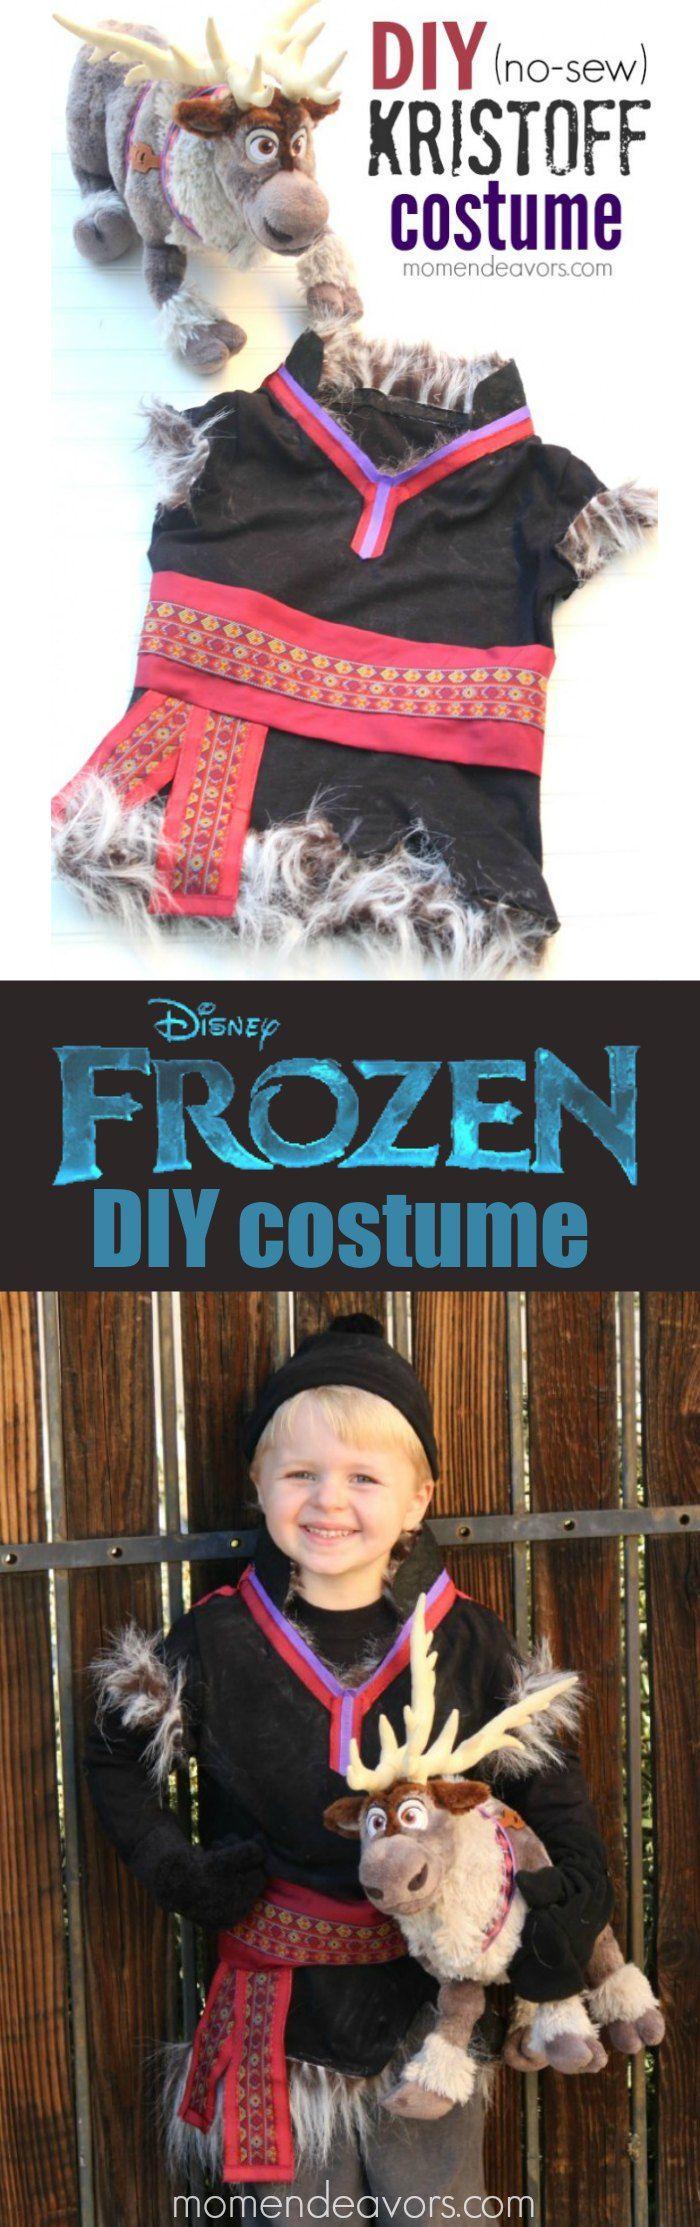 No-Sew DIY Disney FROZEN Kristoff Costume! Perfect Disney Halloween costume for boys!